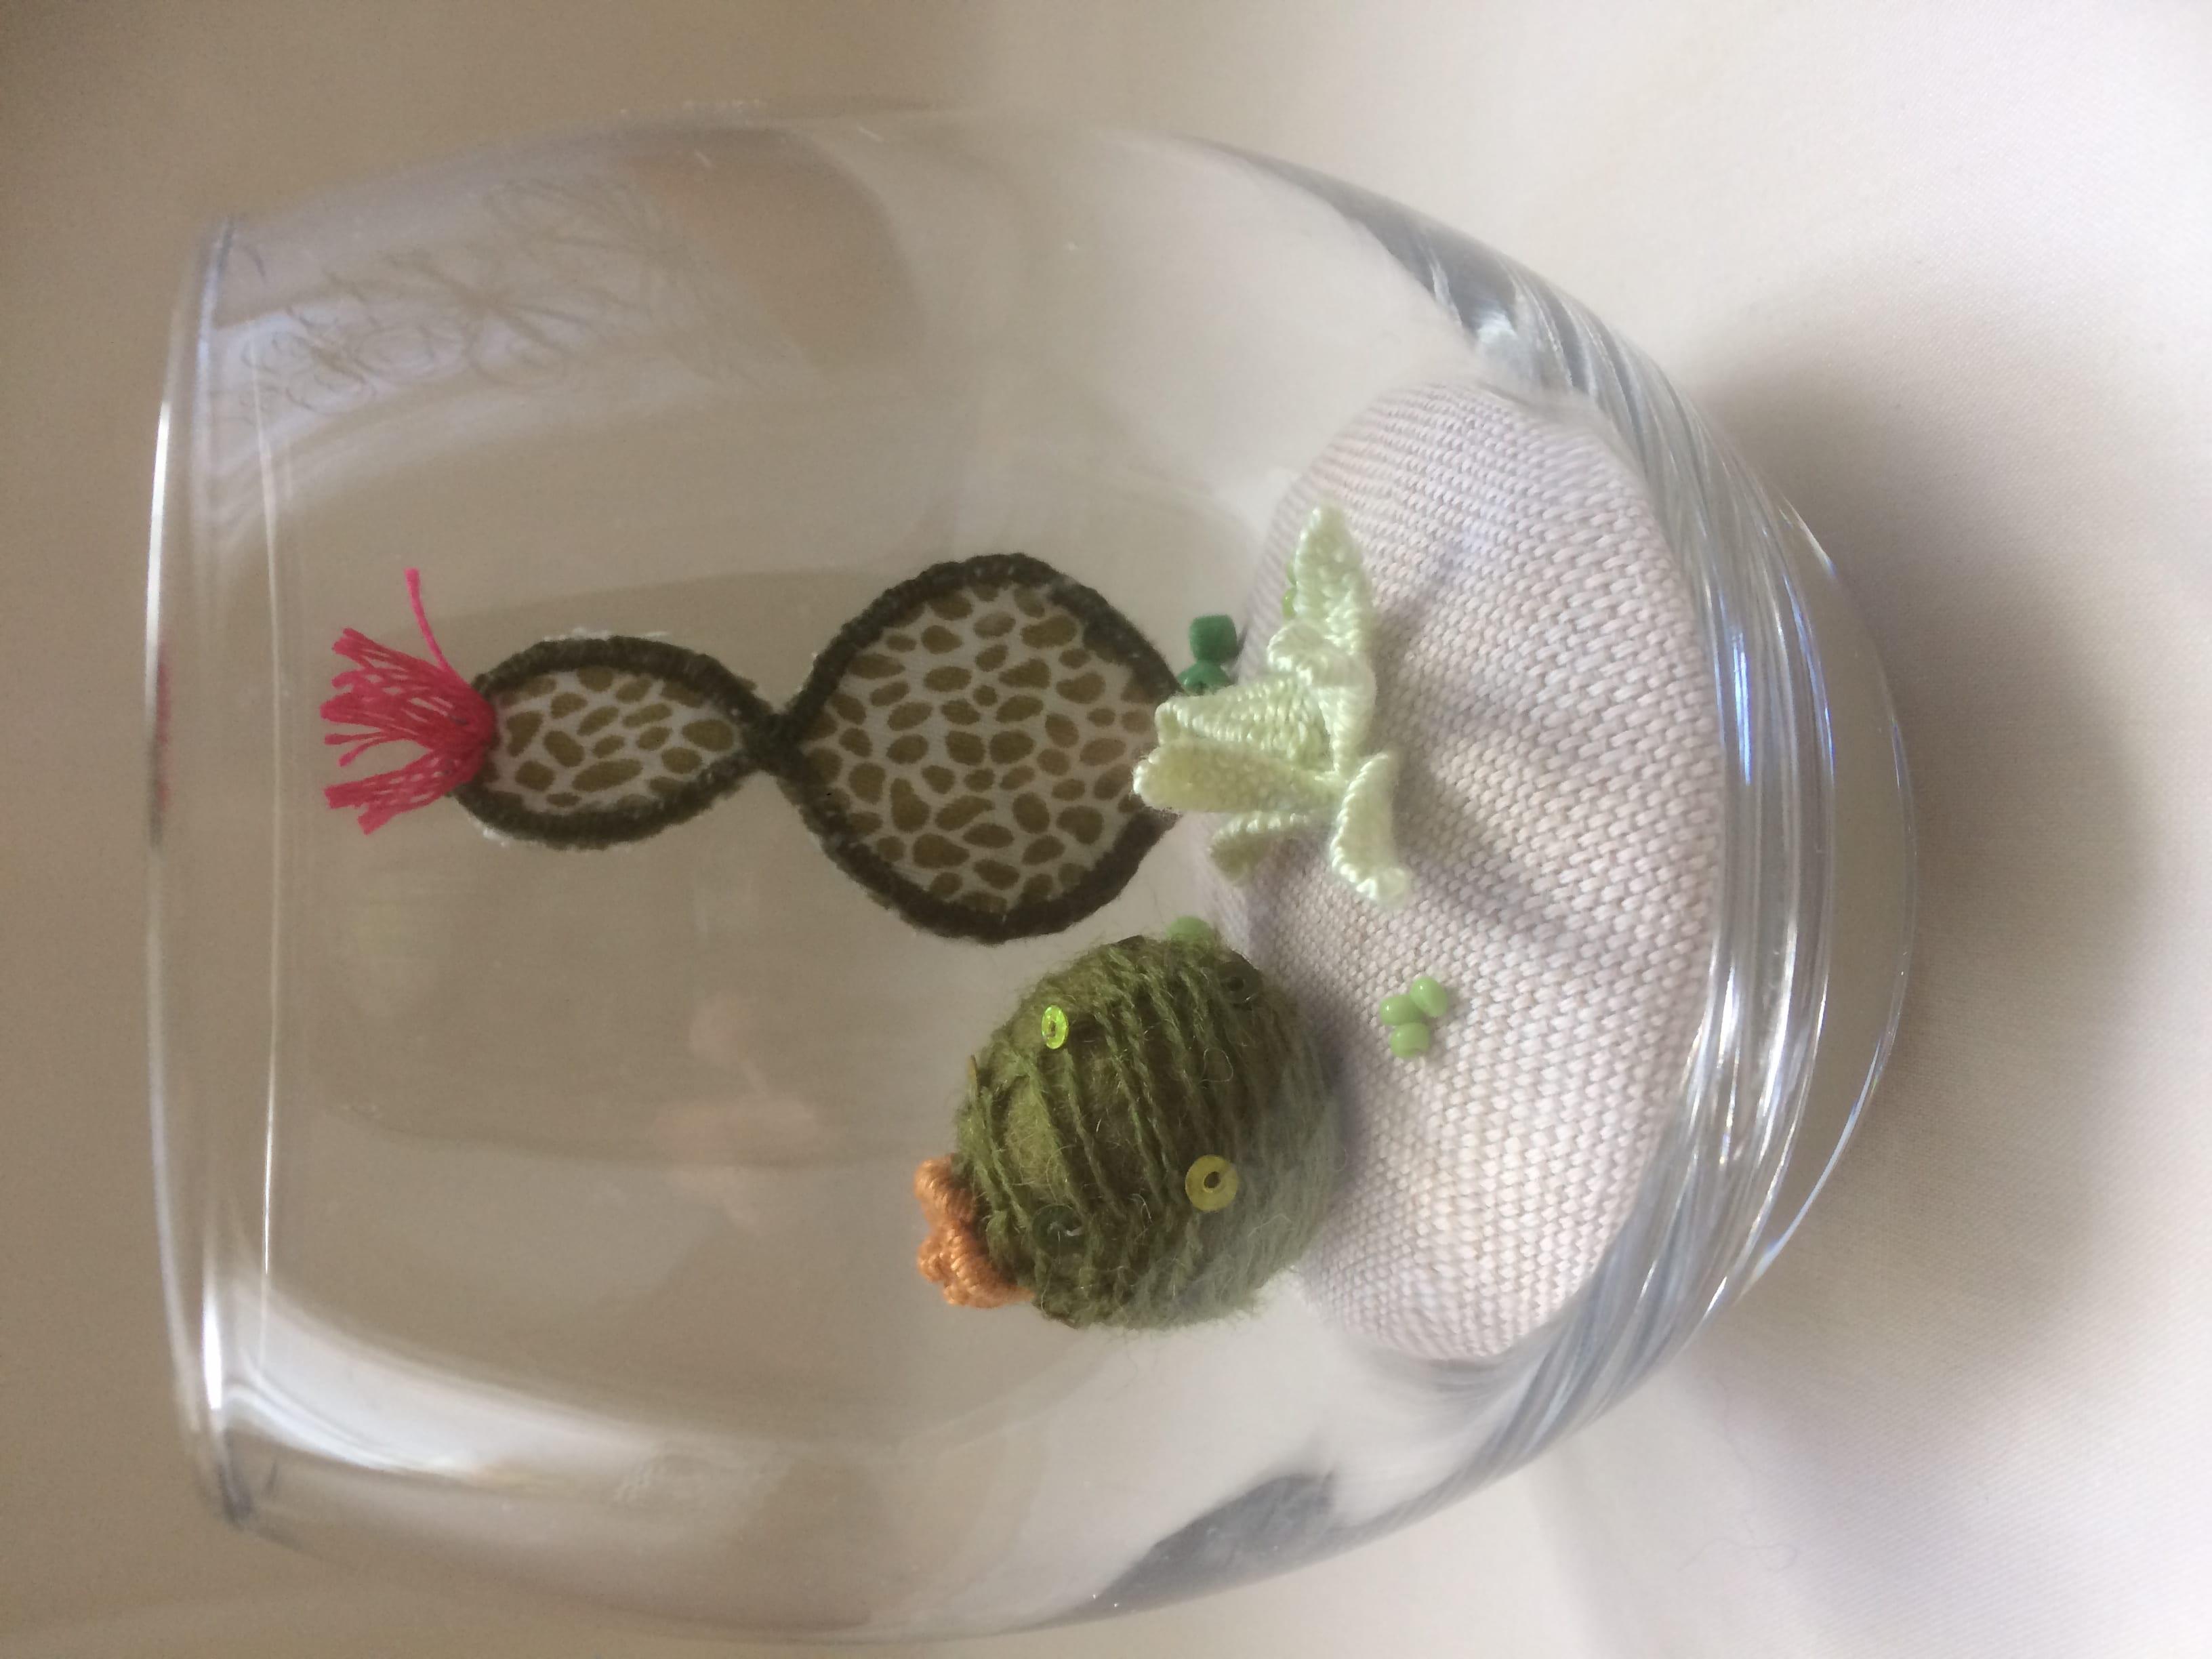 CK Raised Embroidery - Cactus garden